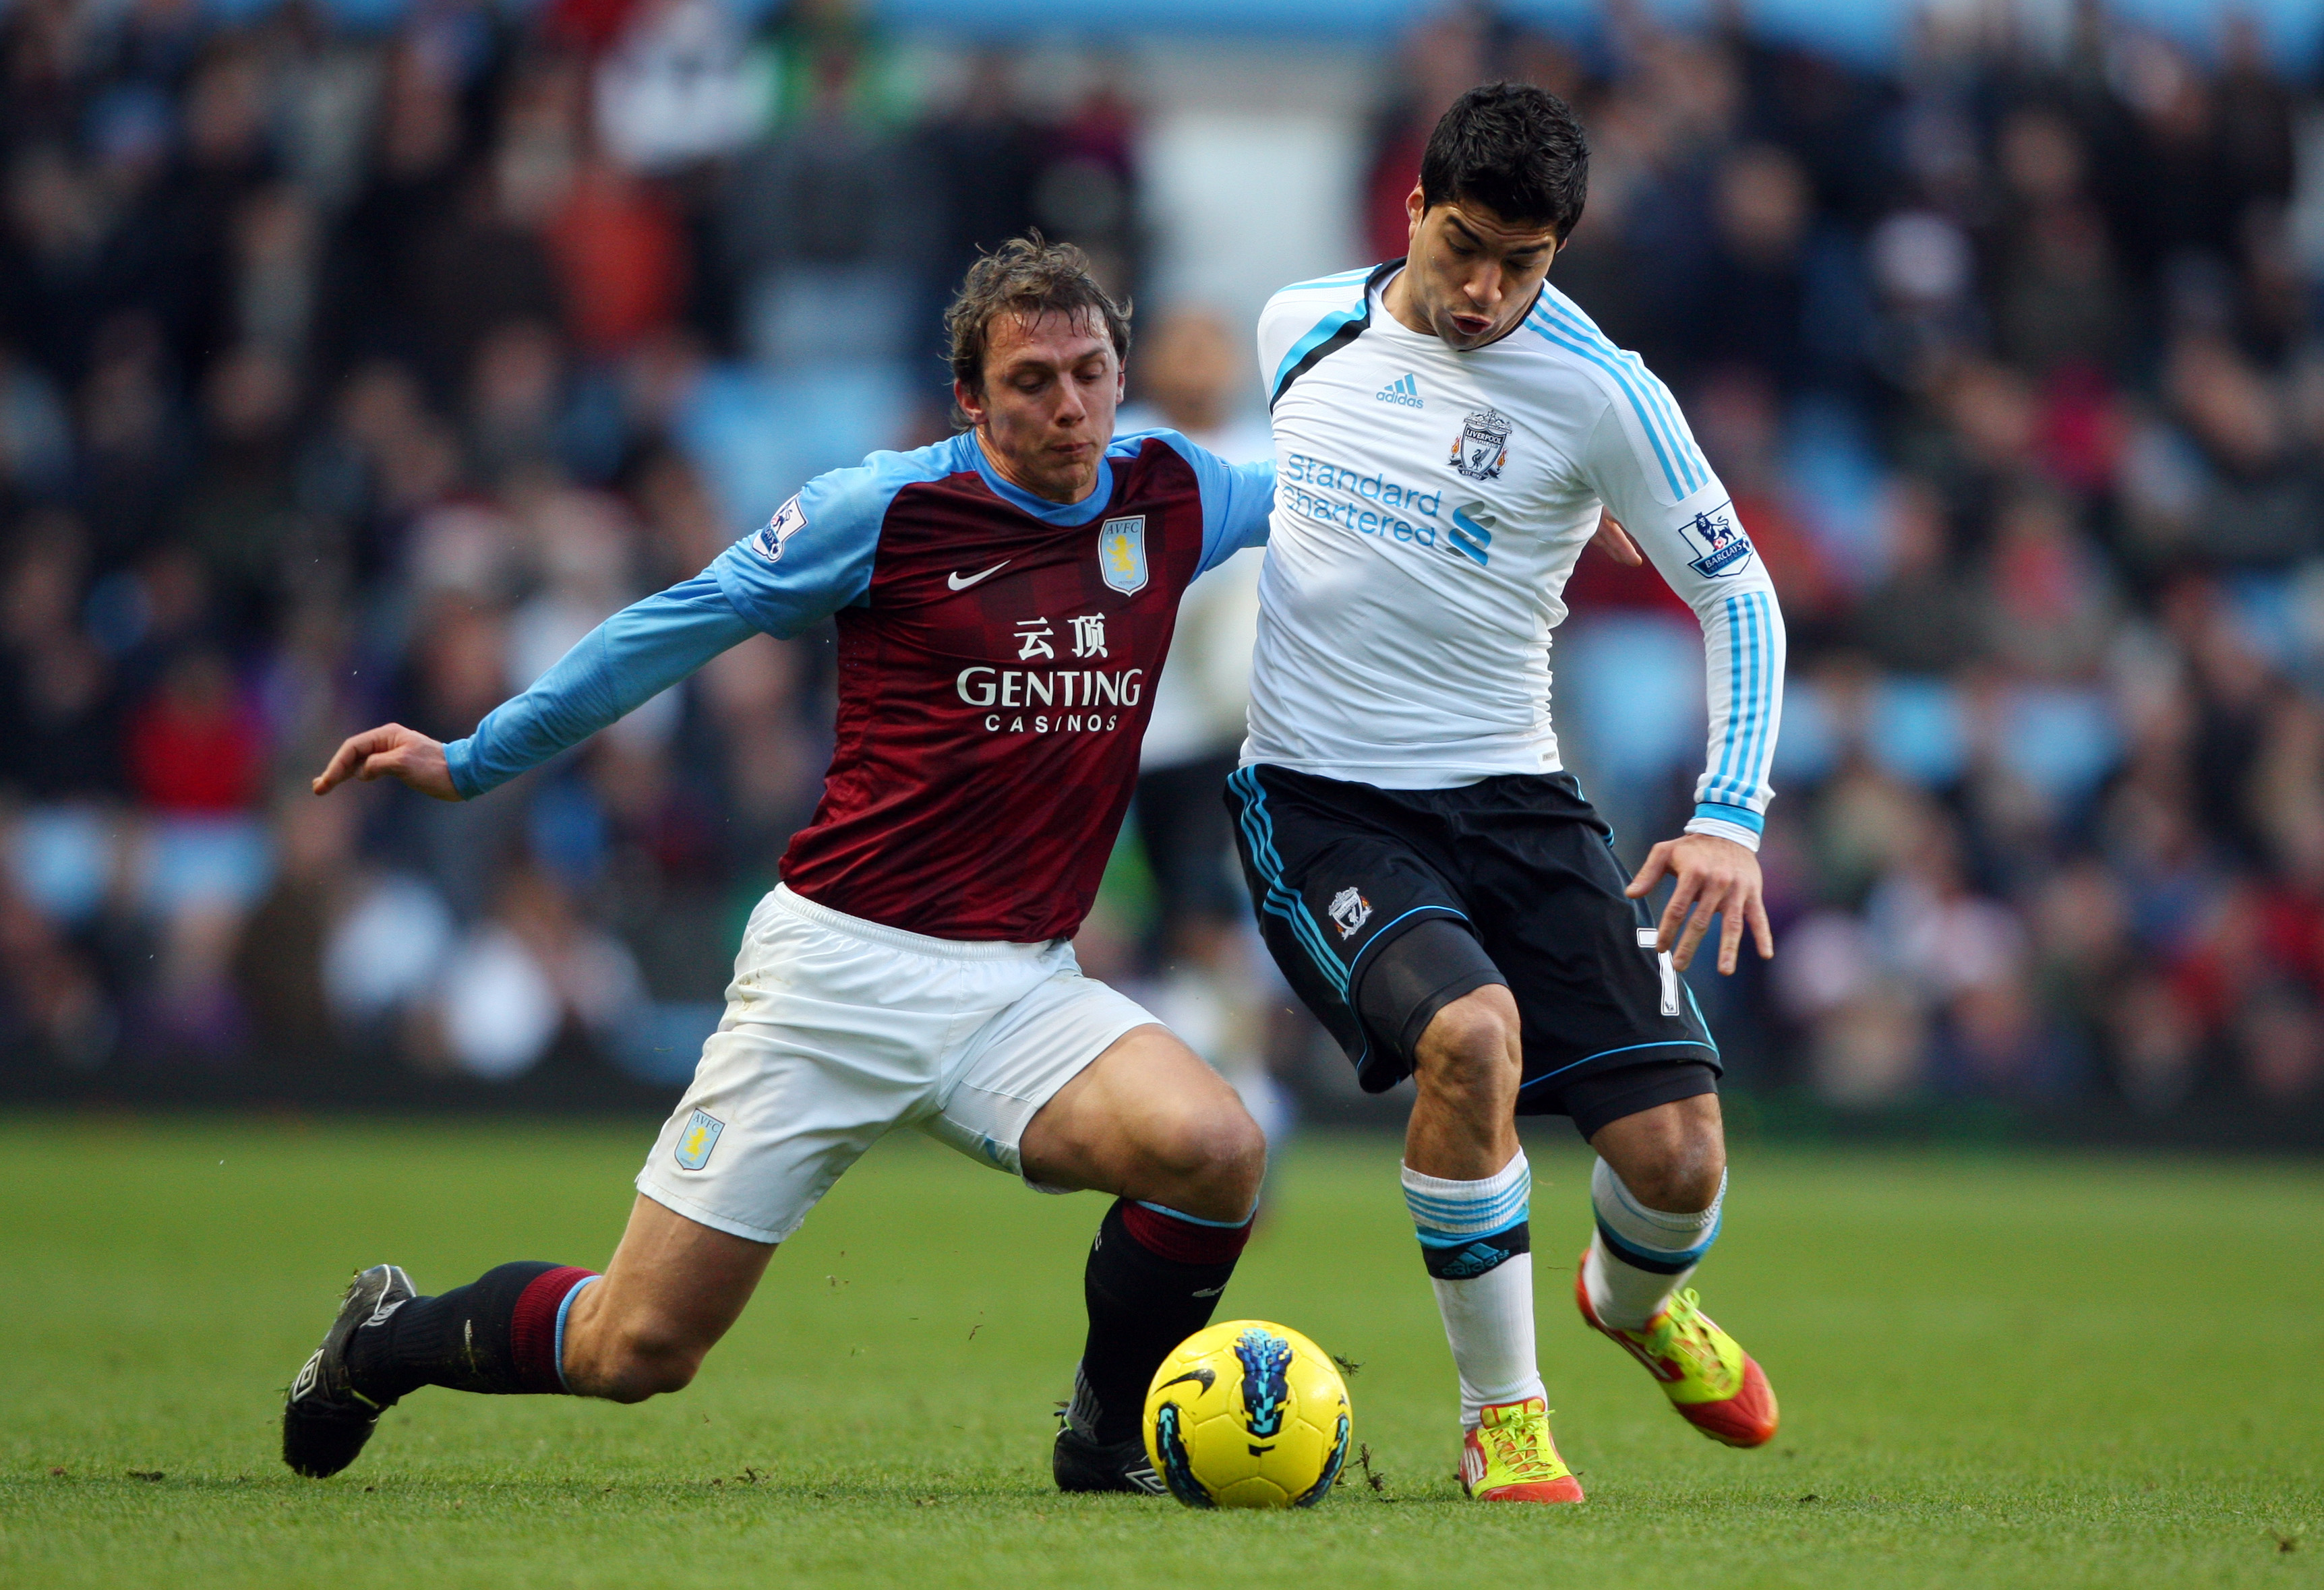 Soccer : Barclays Premier League - Aston Villa V Liverpool